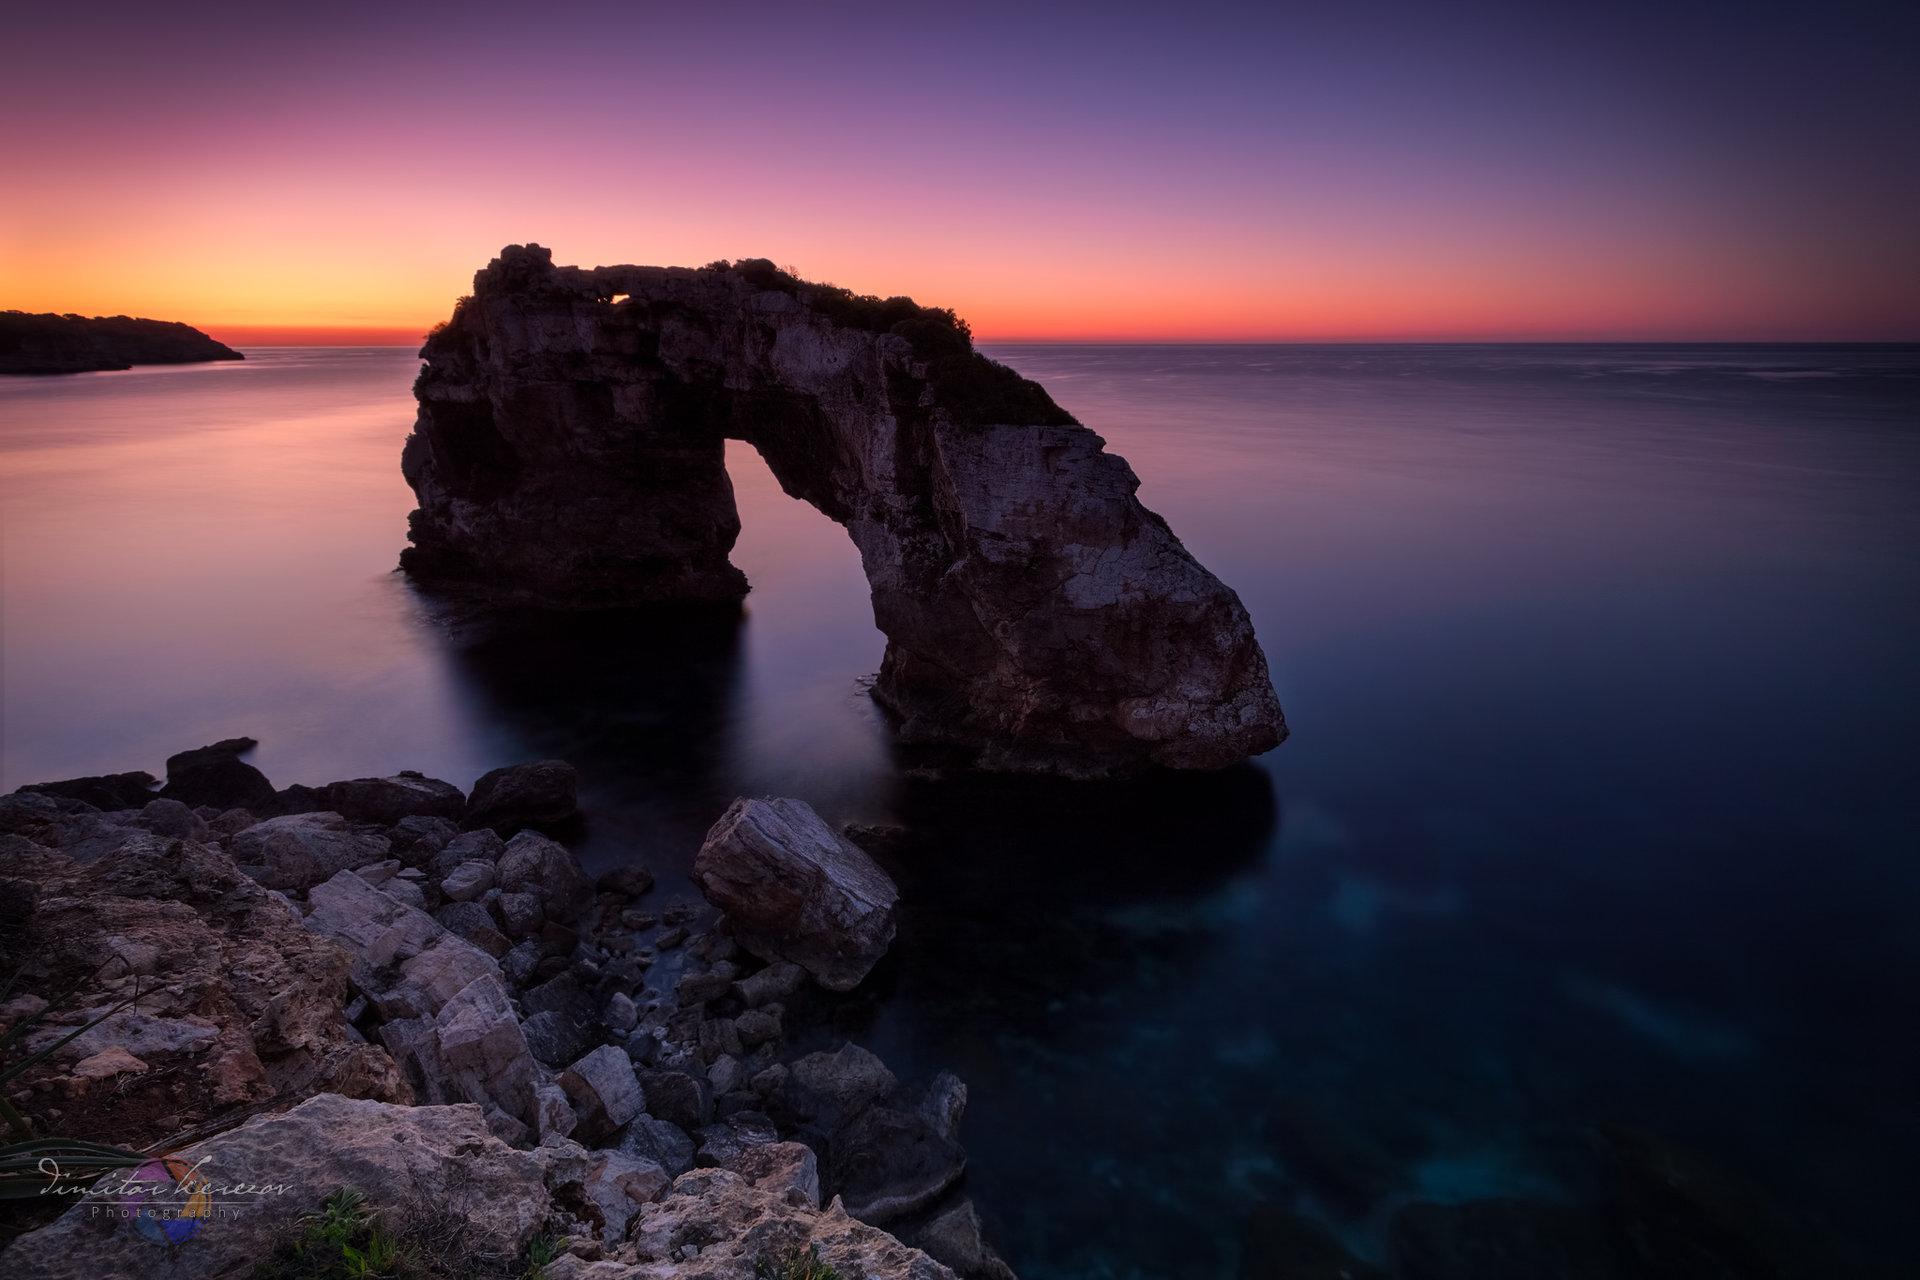 Врата към слънцето - Es Pontàs, Palma De Mallorca